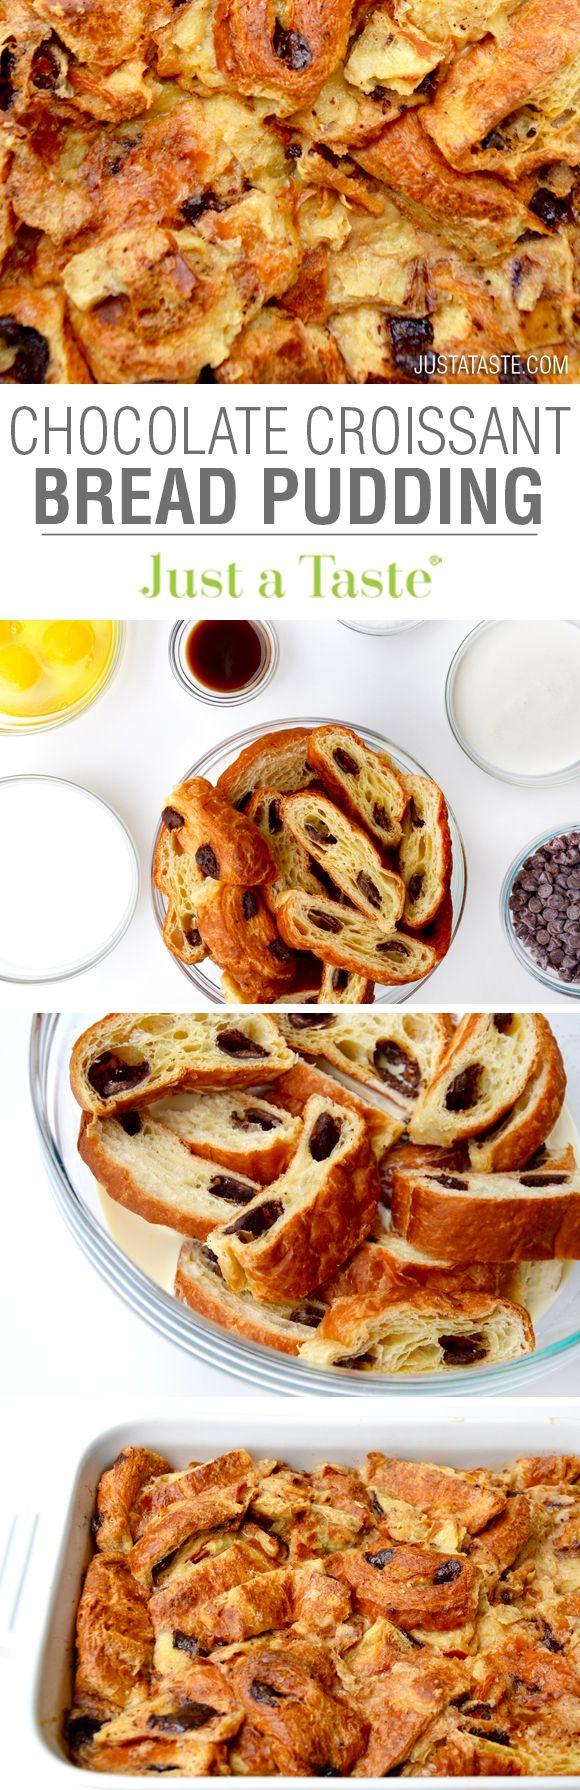 Best 25+ Croissant bread ideas on Pinterest